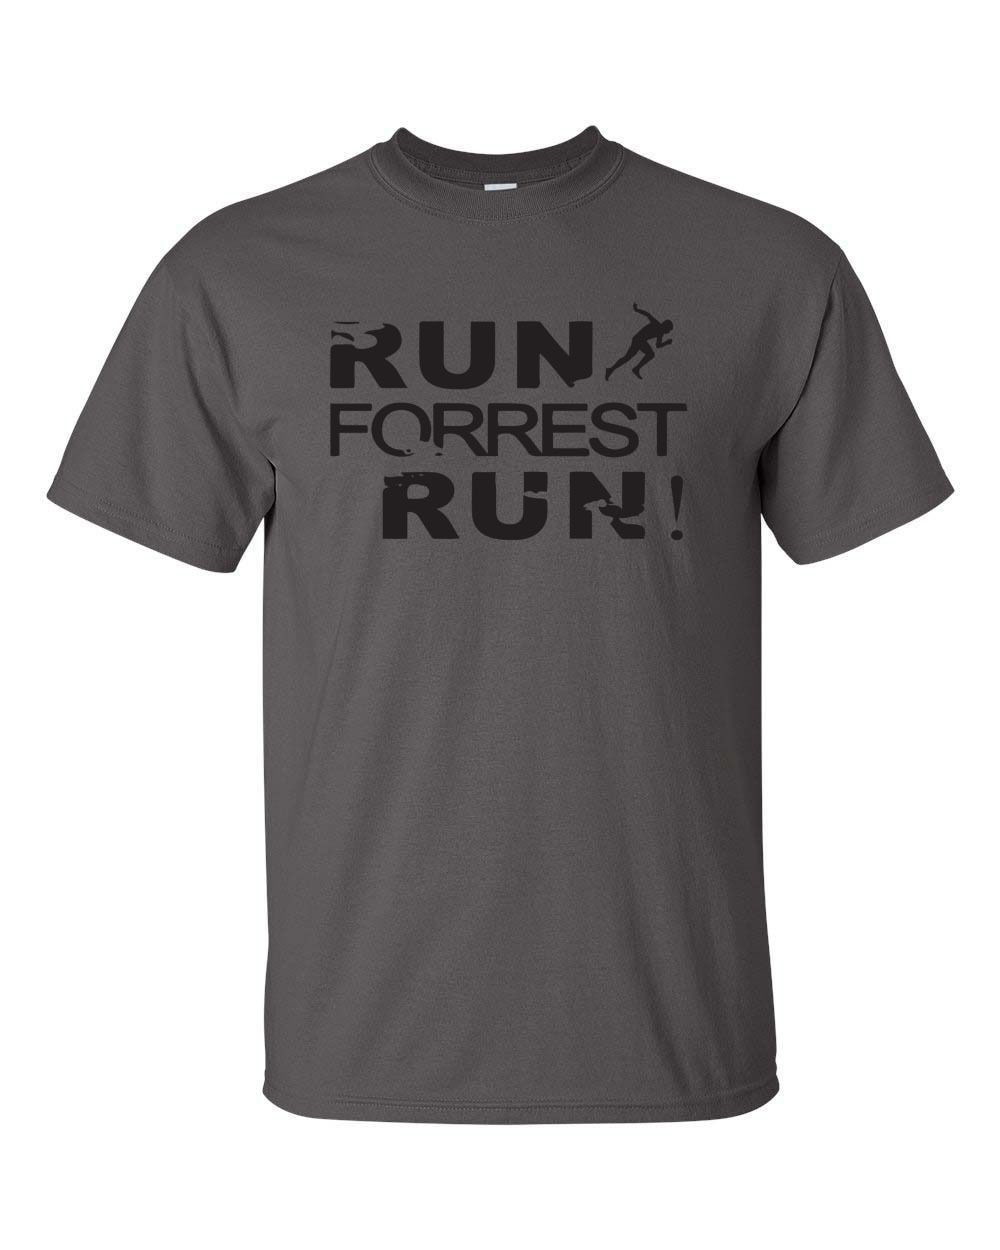 Run Forrest Run Movie Retro Gump Running Workout Funny Men S Tee